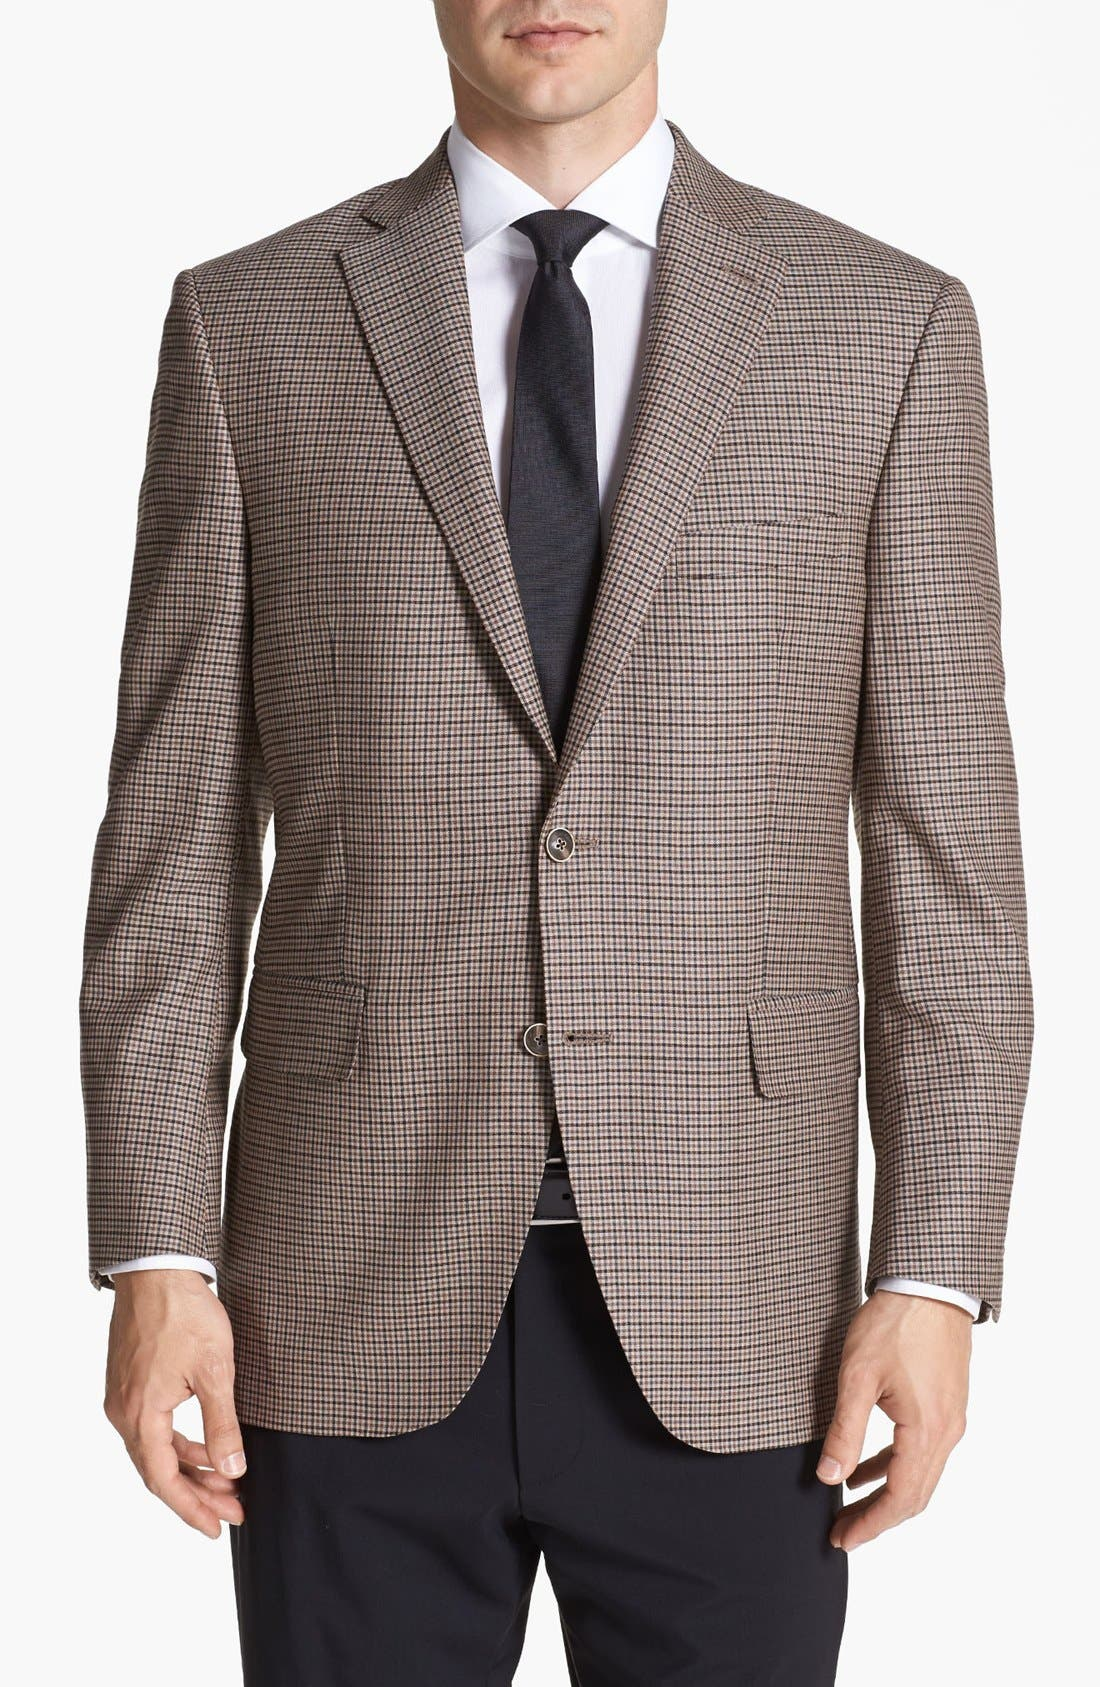 Alternate Image 1 Selected - Peter Millar Check Wool Sportcoat